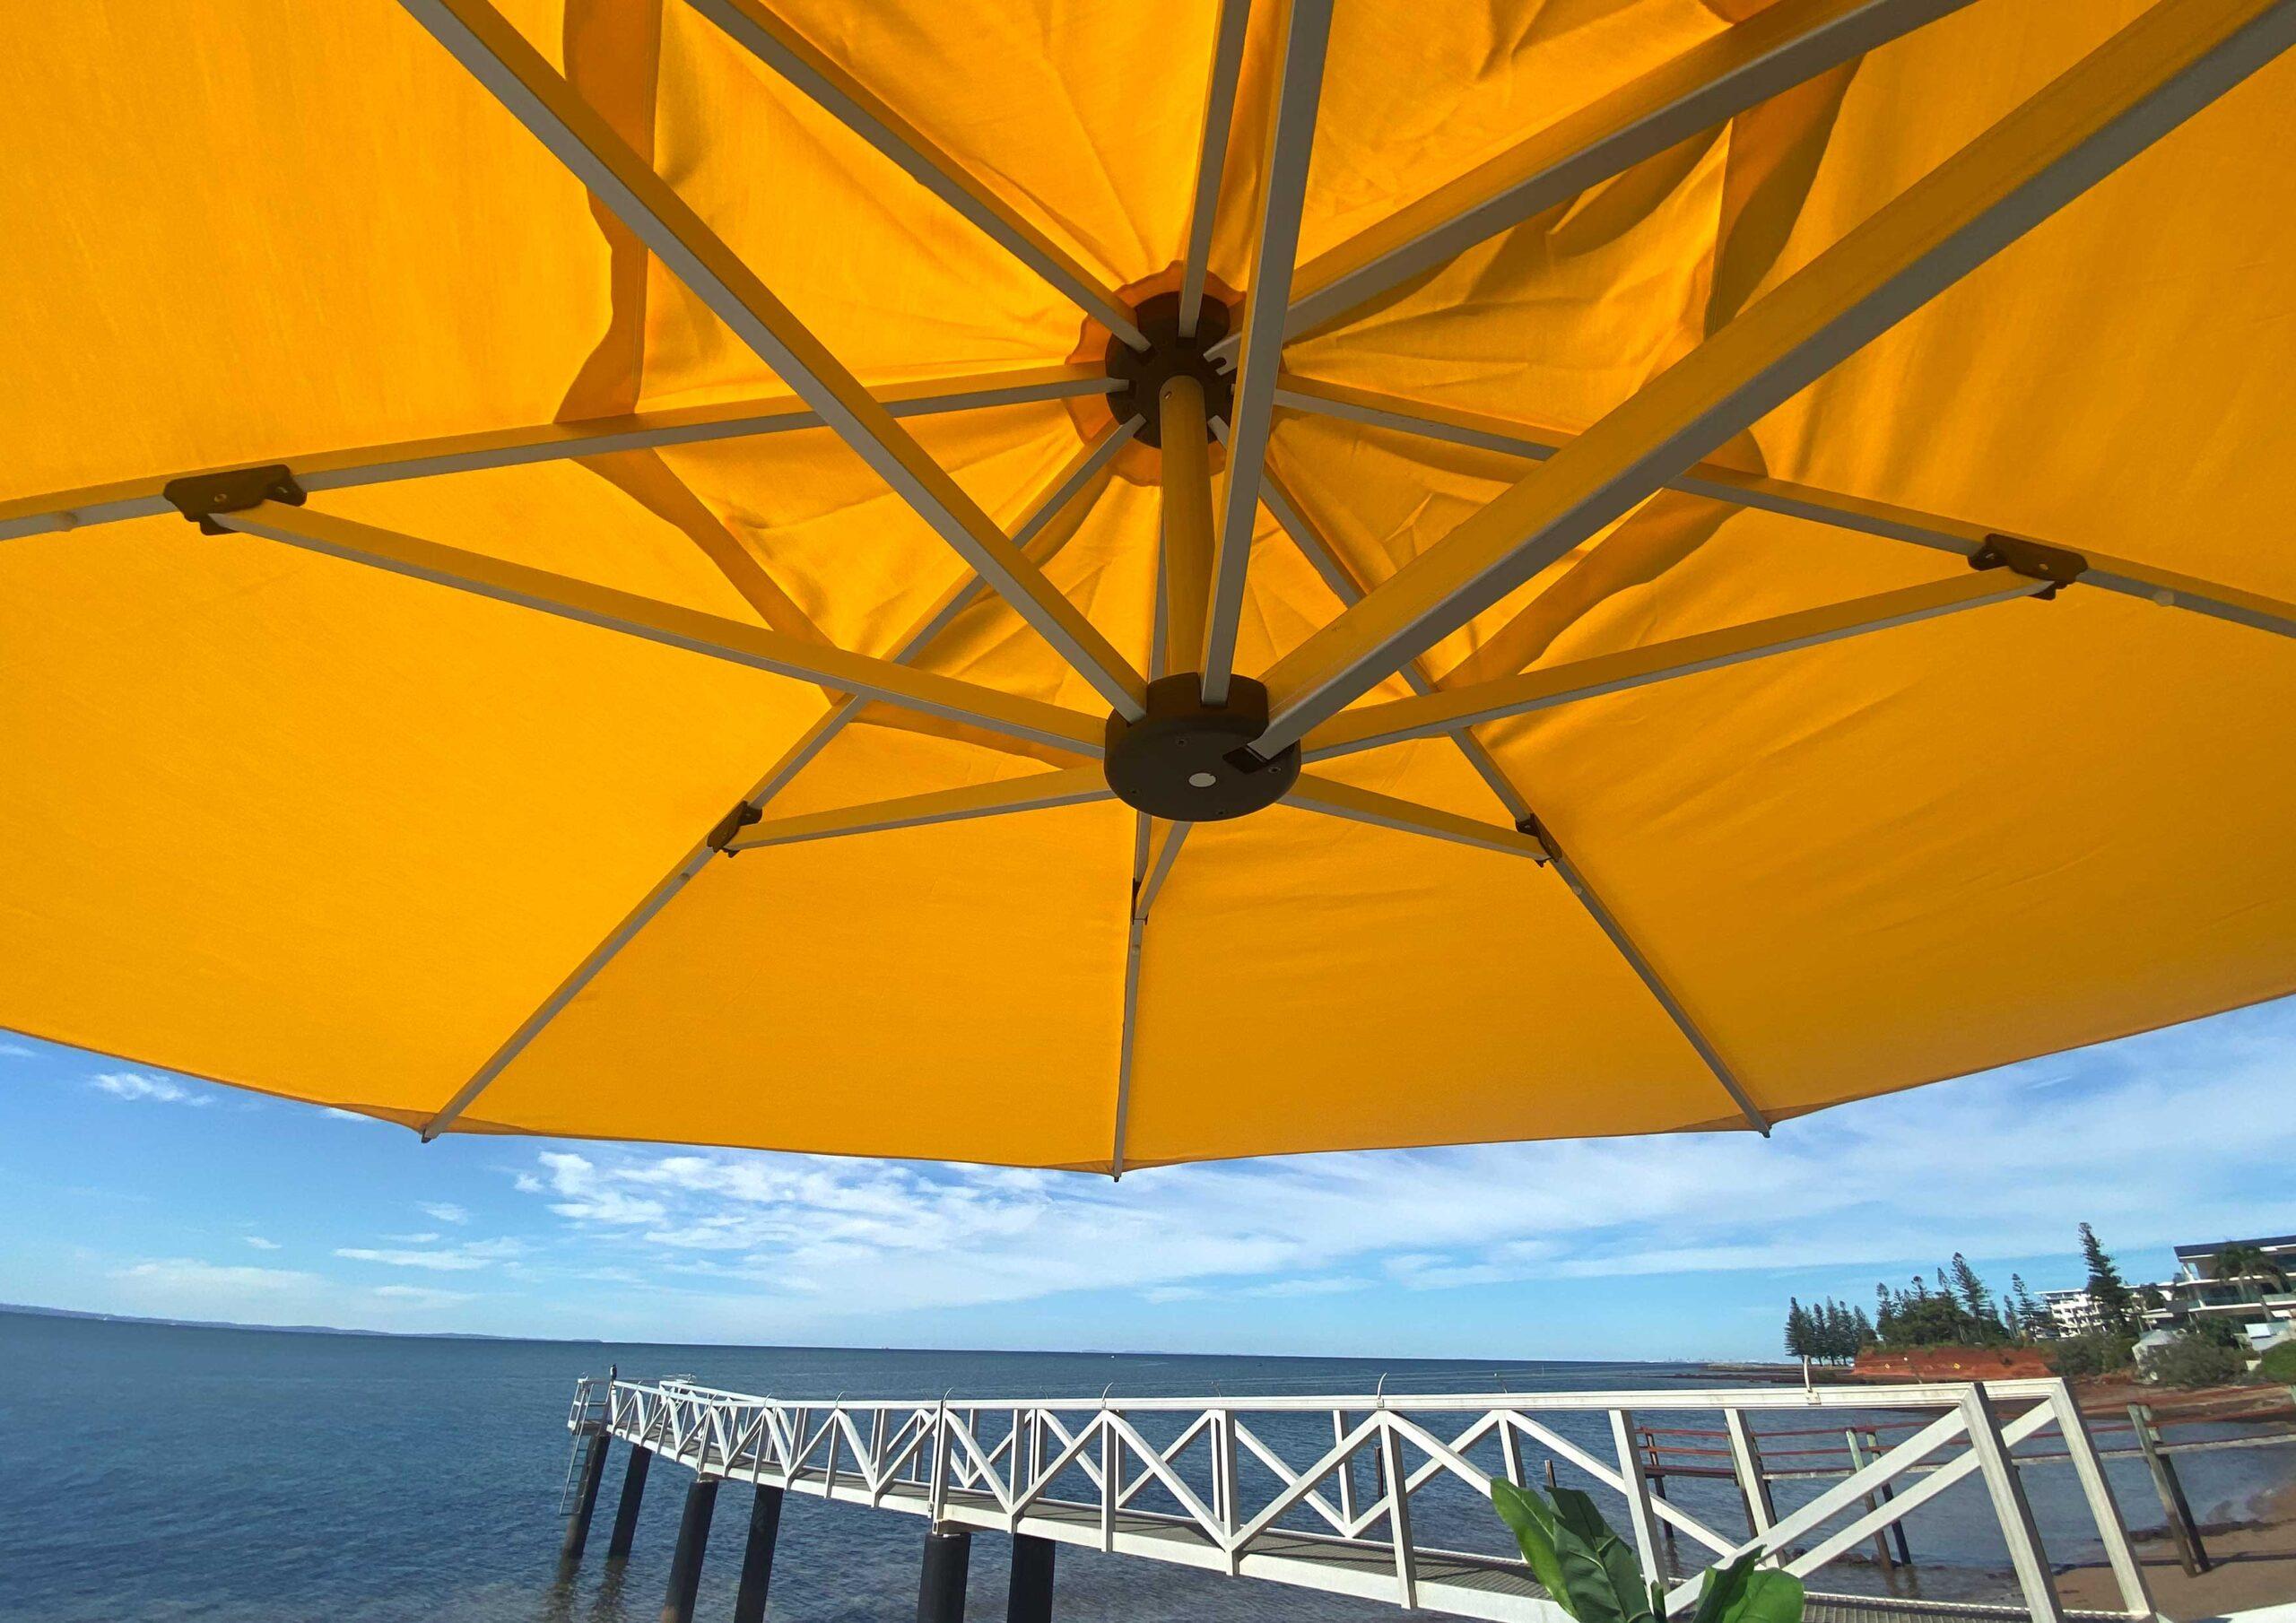 fs gallery images cantilever round octogon umbrella 4